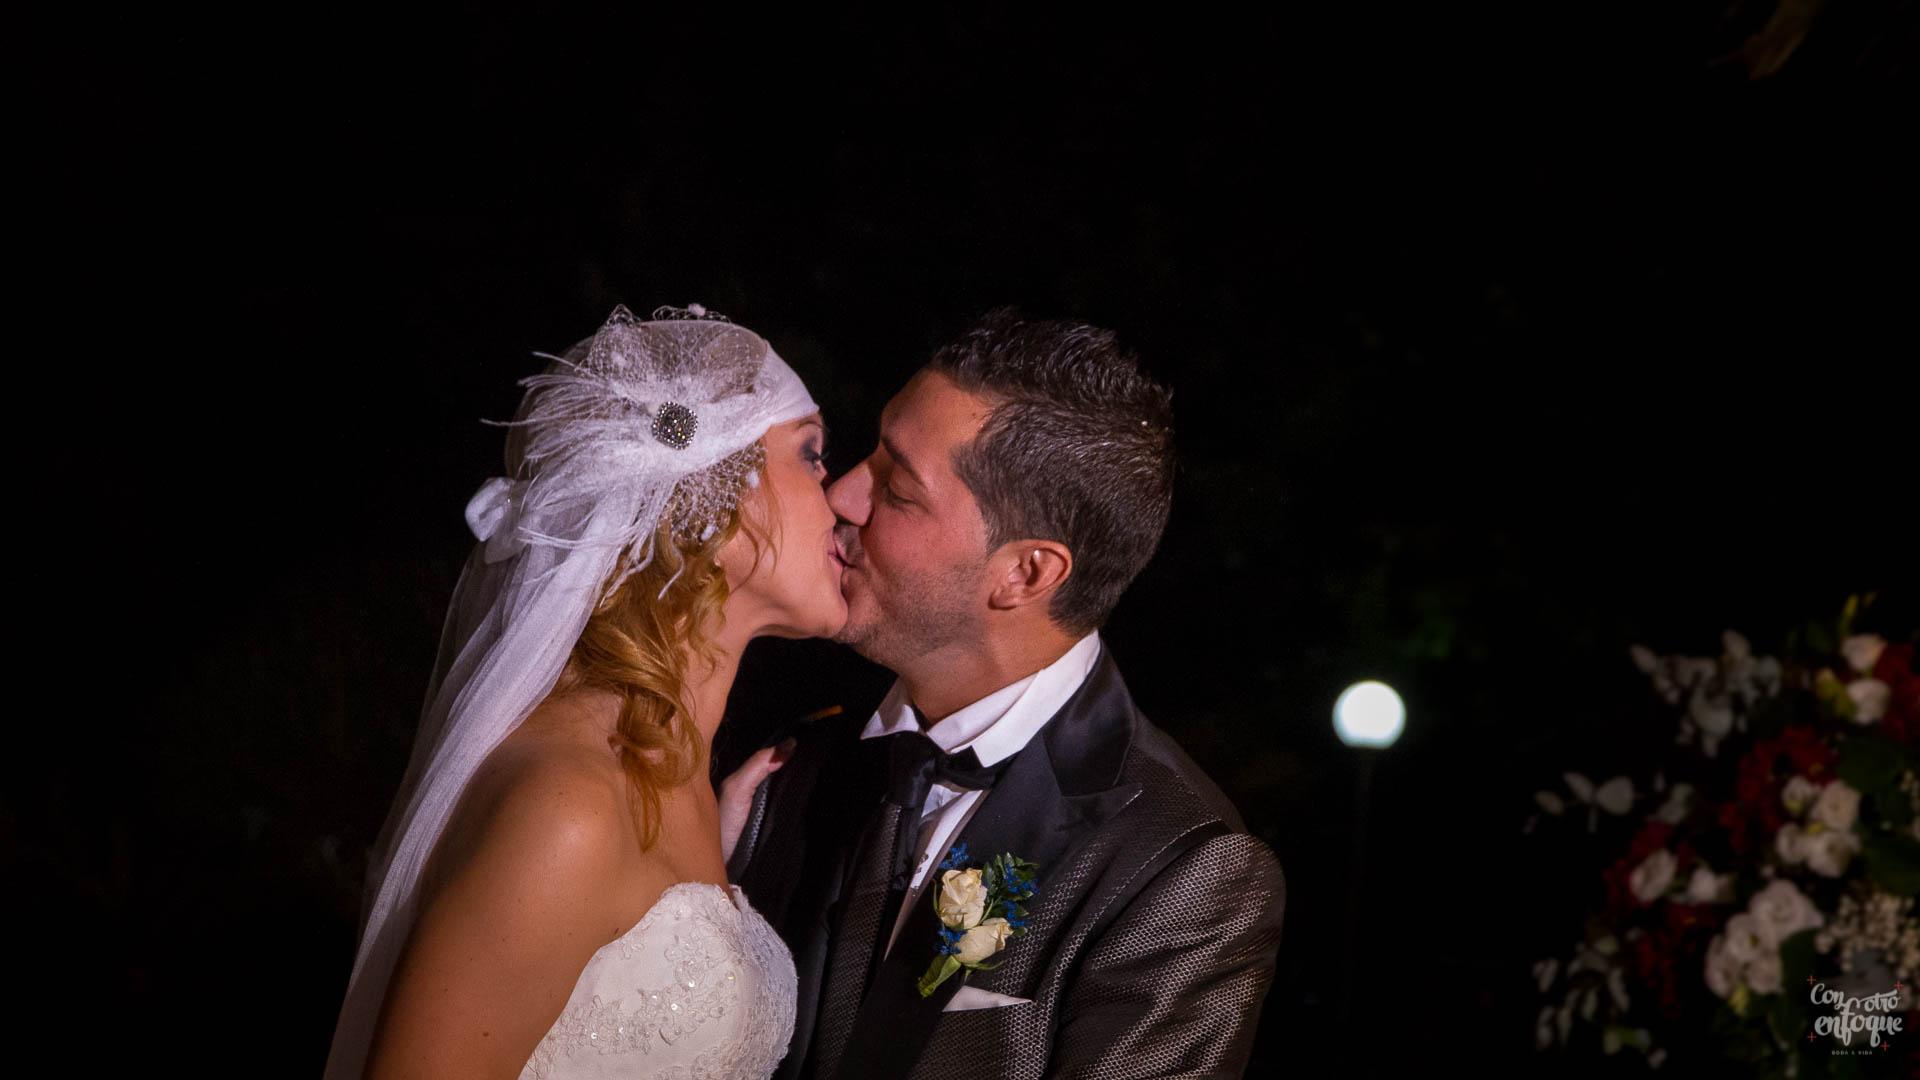 dudas sobre fotógrafos de boda en Valencia. Beso con Luna